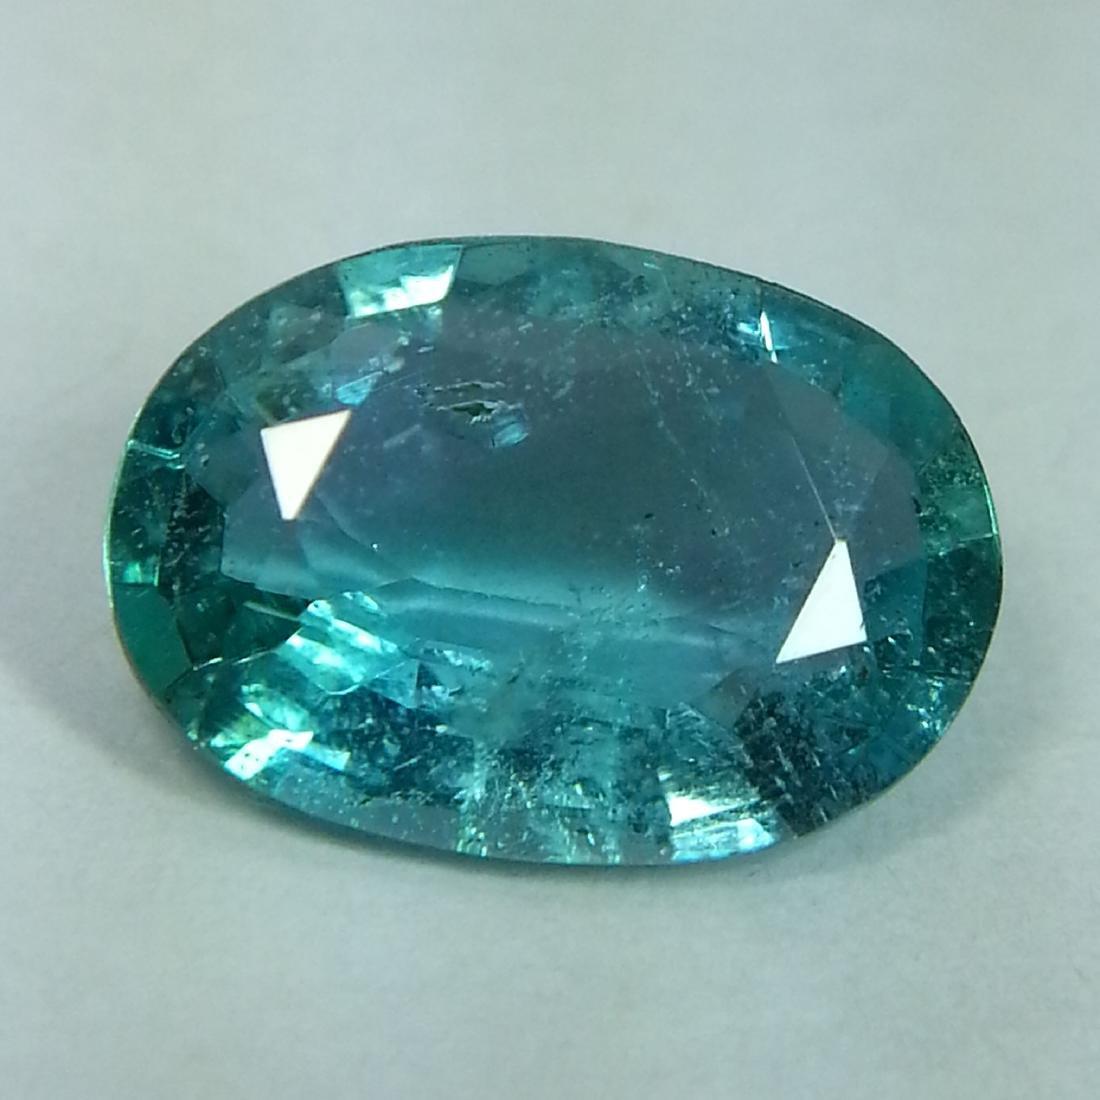 Emerald - 1.16 ct - 2